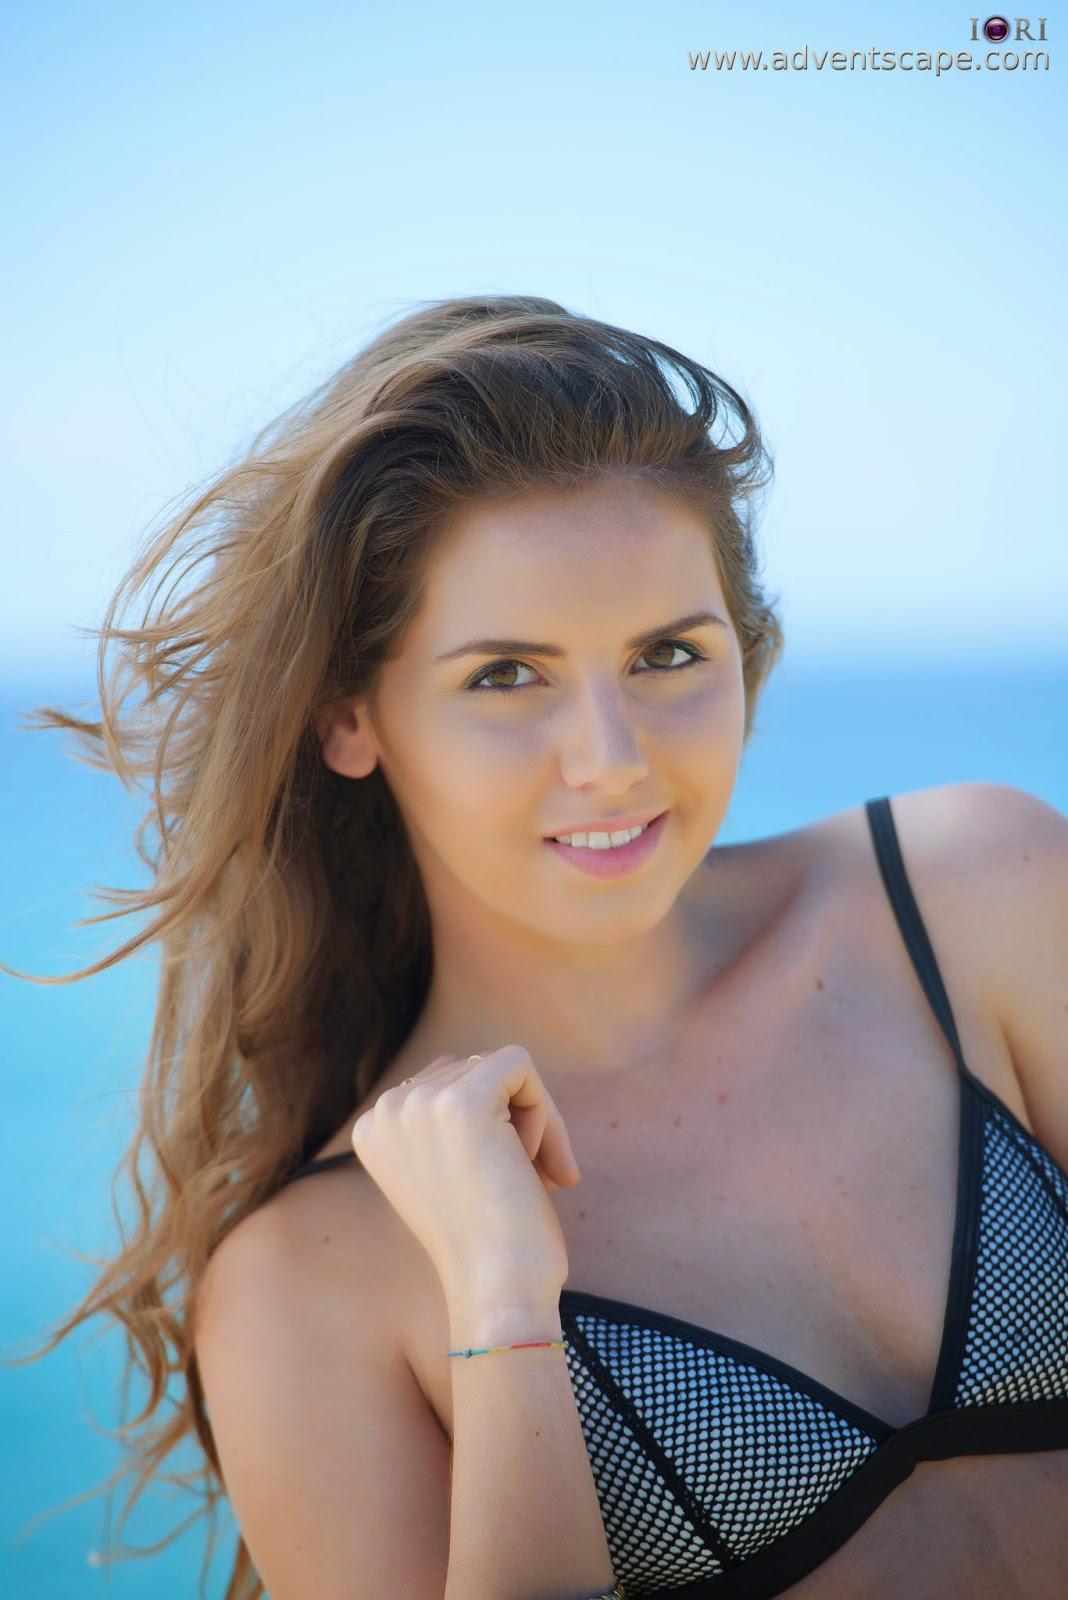 Australia, Australian Landscape Photographer, beach, bikini, Curl Curl, glamour, model, New South Wales, Nicole, Northern Beaches, NSW, Philip Avellana, Nicole788